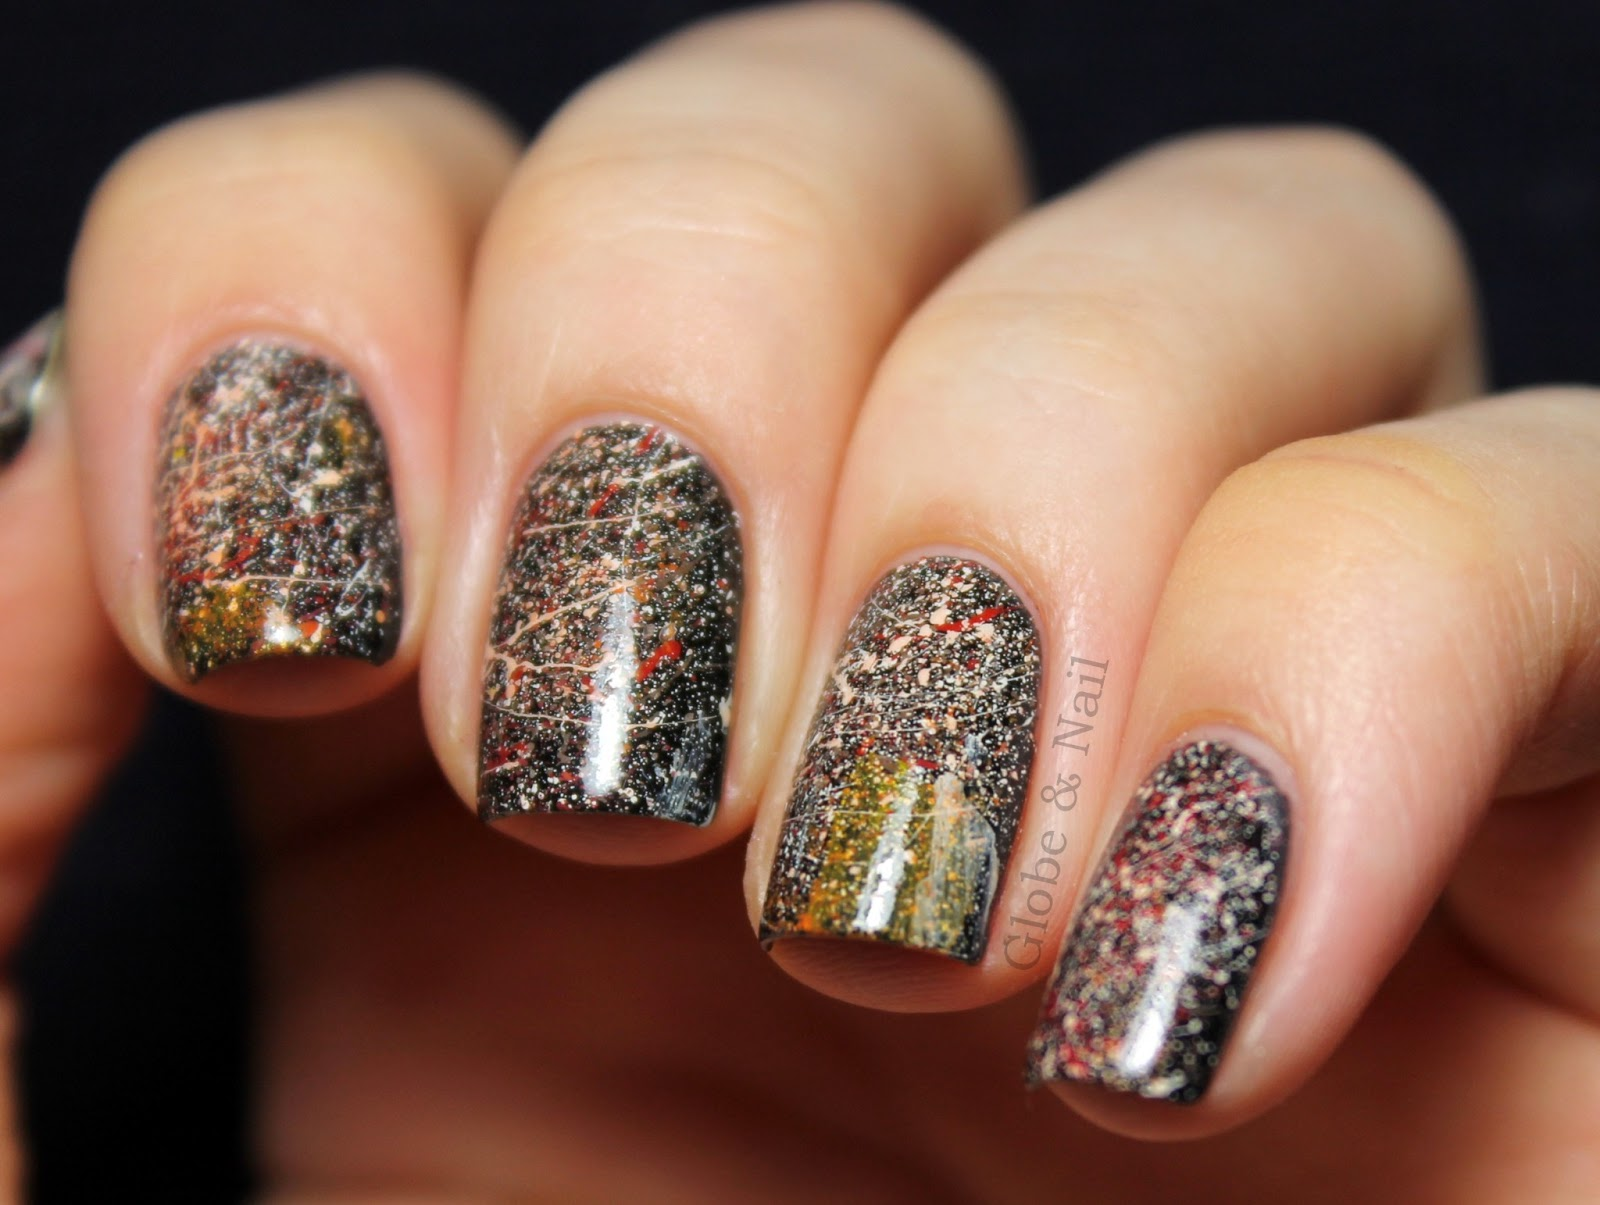 Nail art paint splatter great photo blog about manicure 2017 nail art paint splatter prinsesfo Gallery